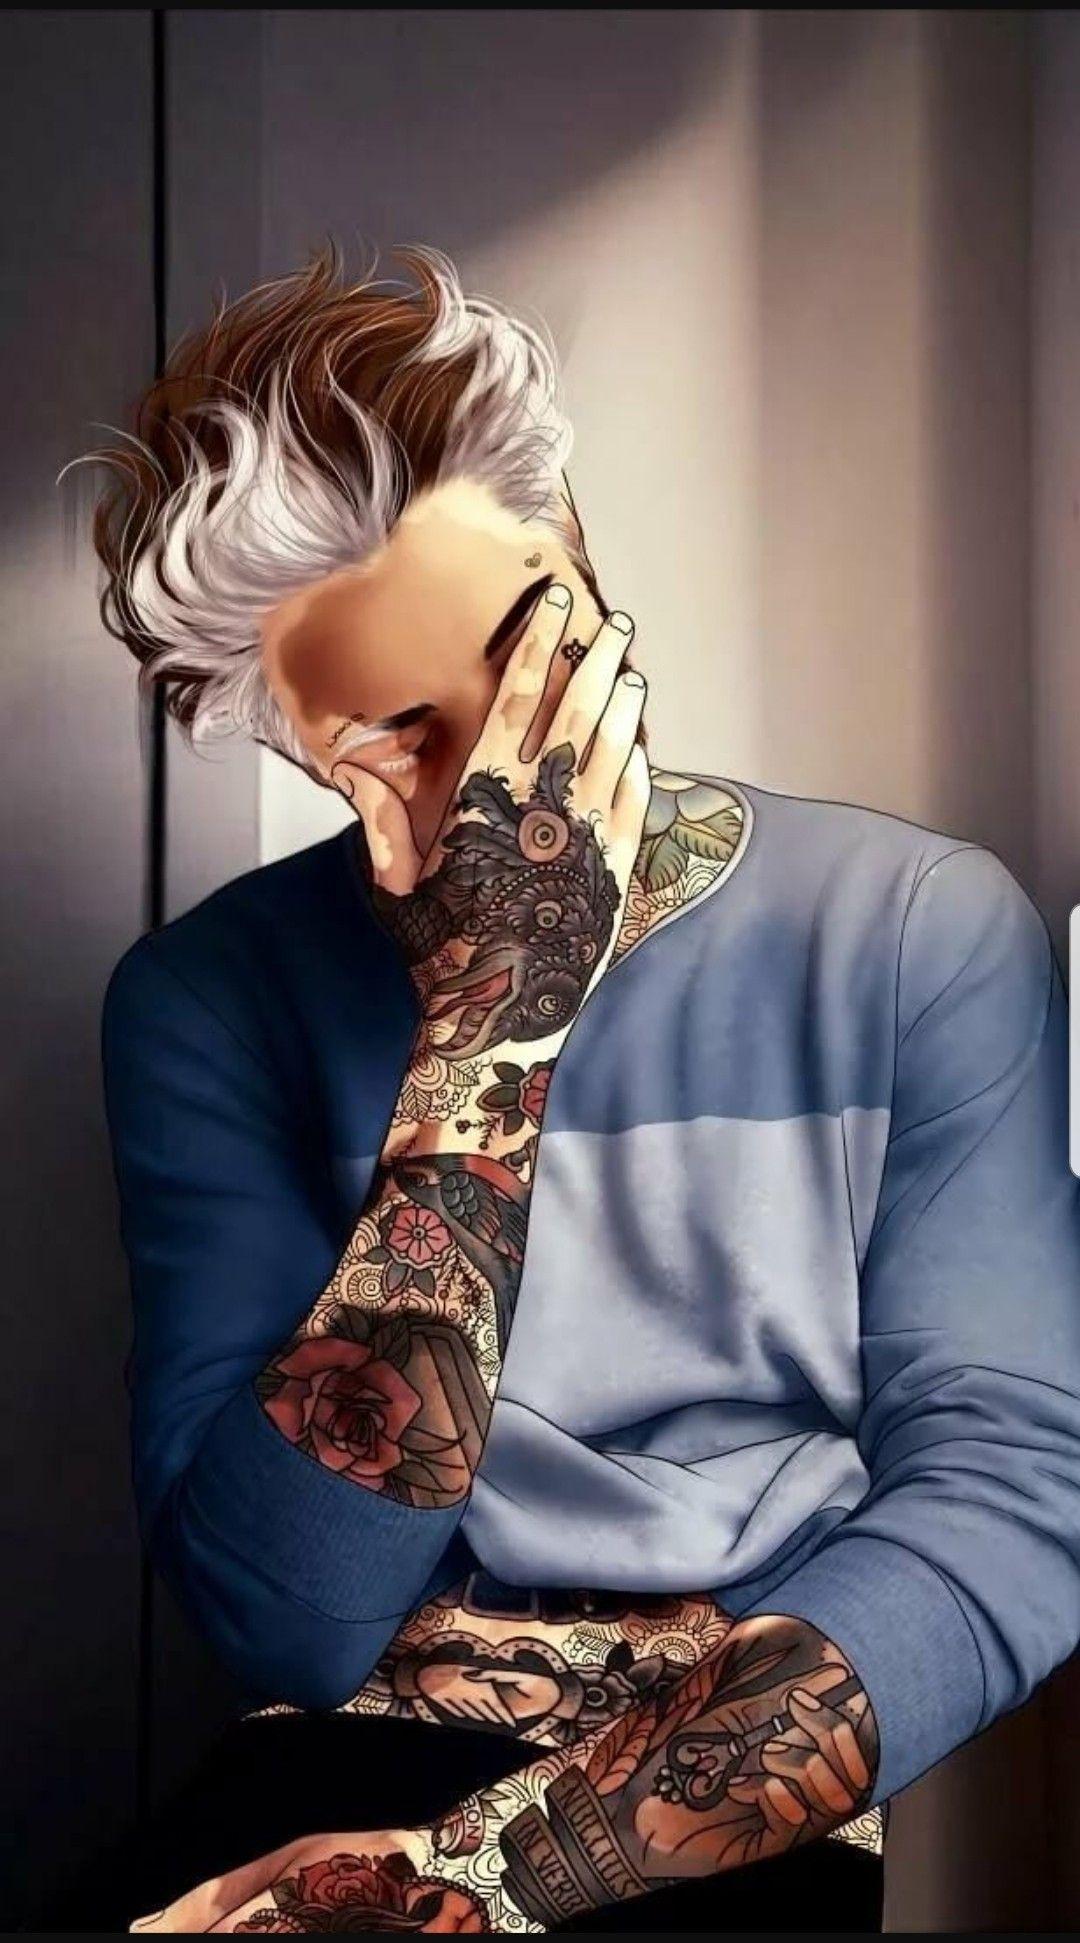 Pin On Anime Crazy Tattoo boy wallpaper hd